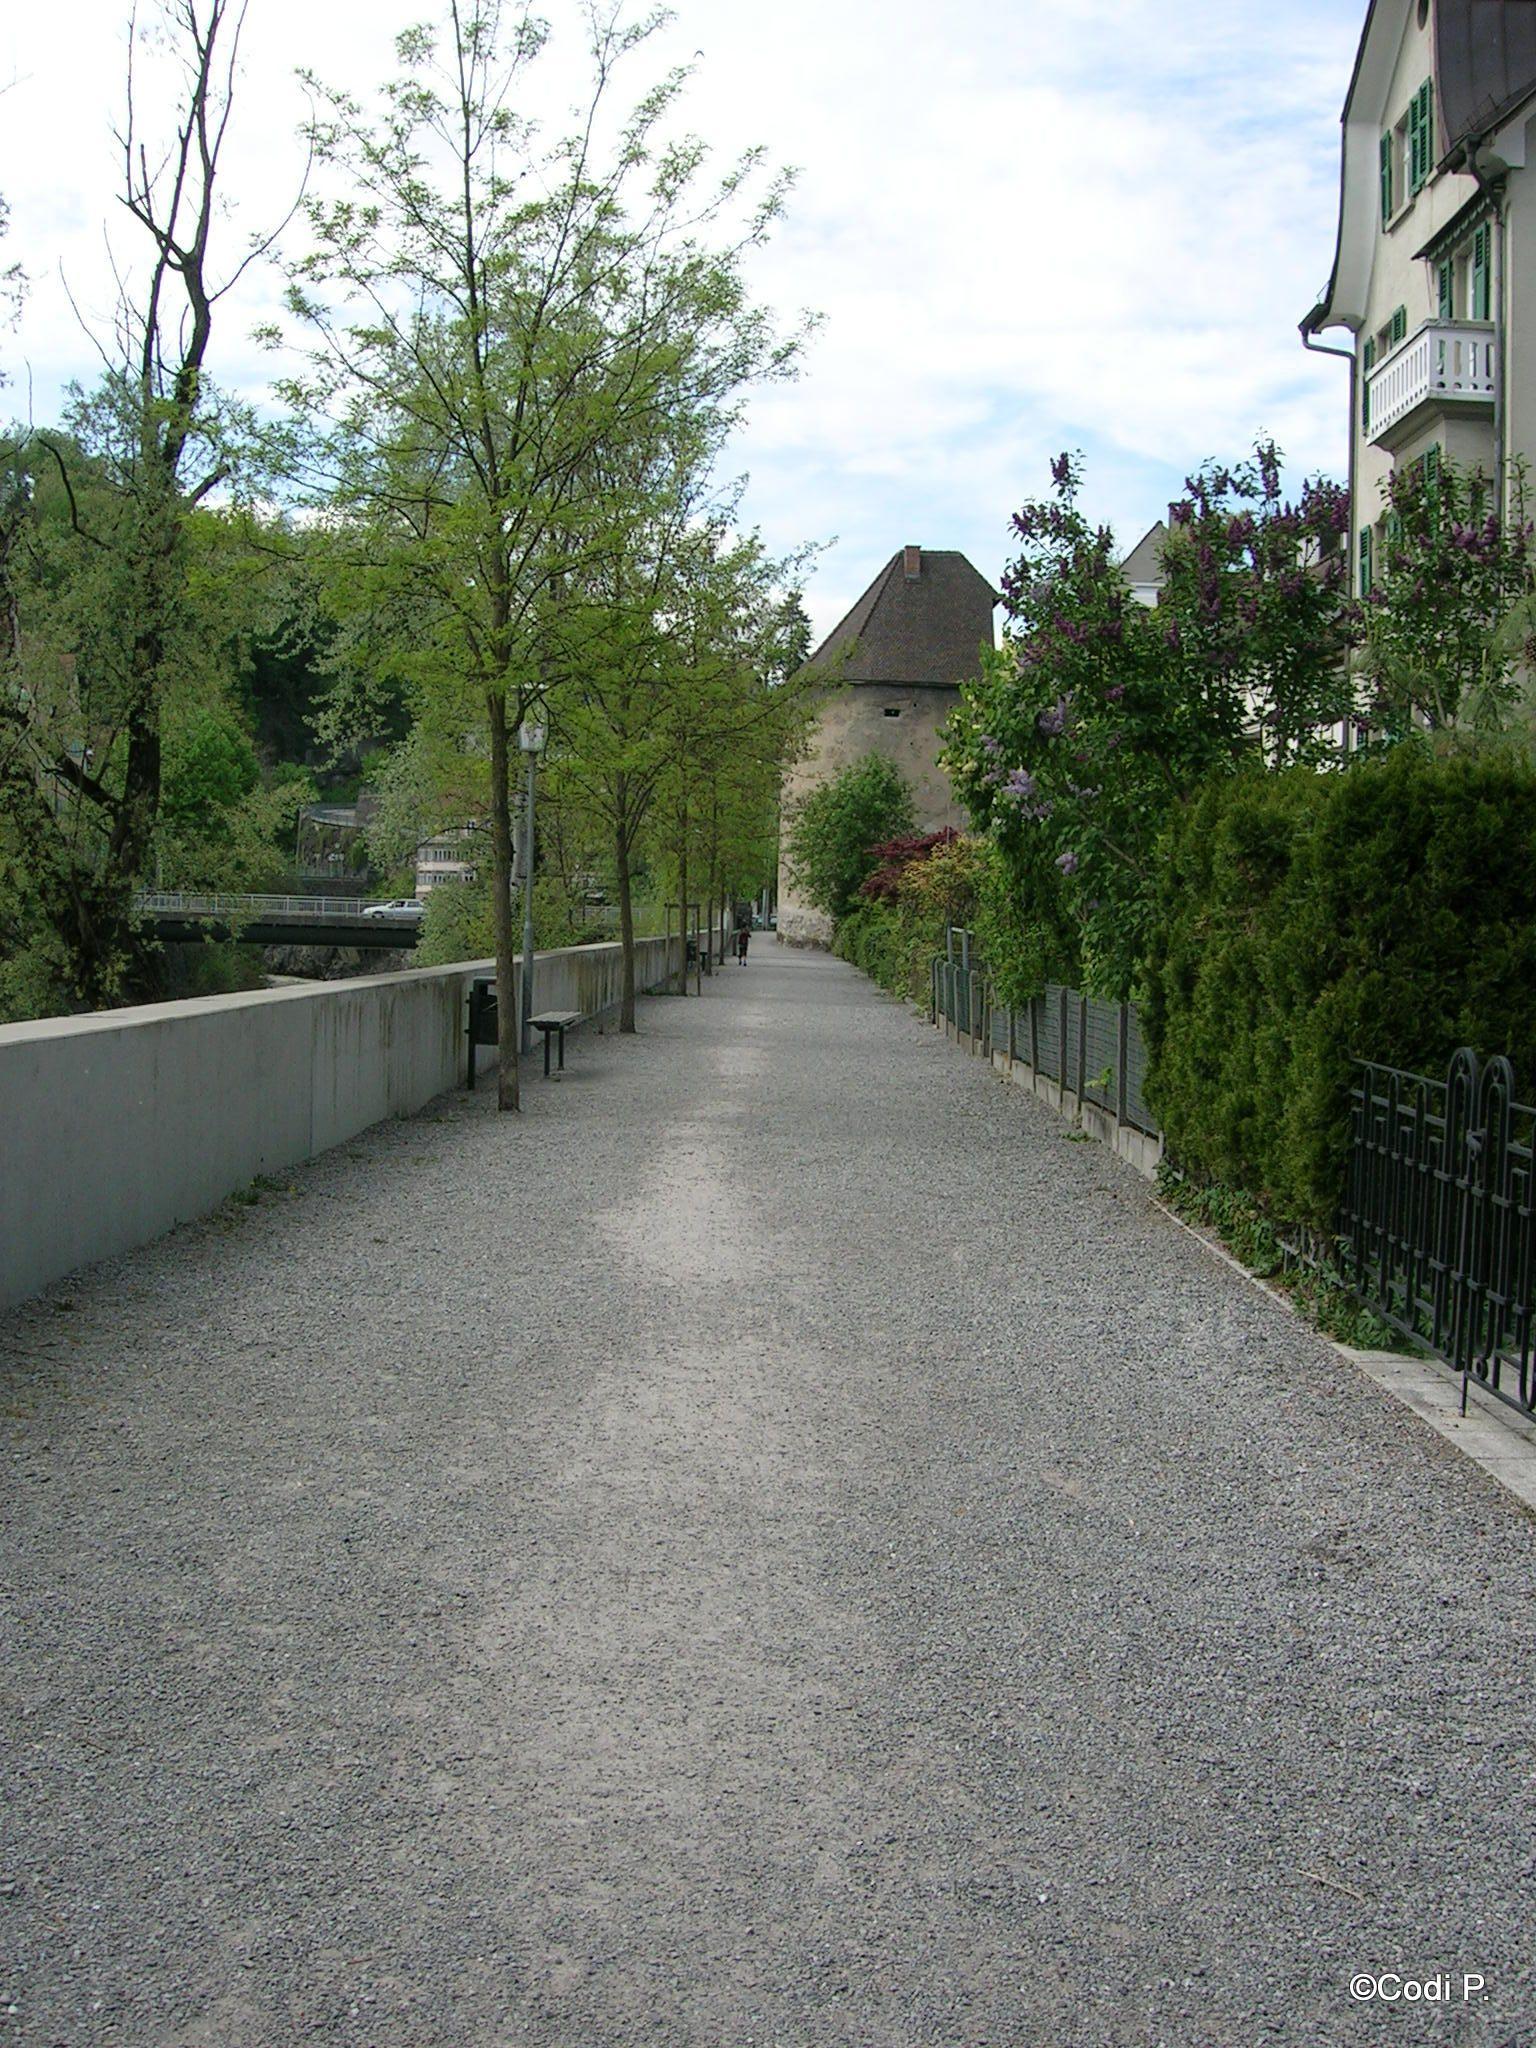 kiesweg | fotos | pinterest | kiesweg und gartenweg